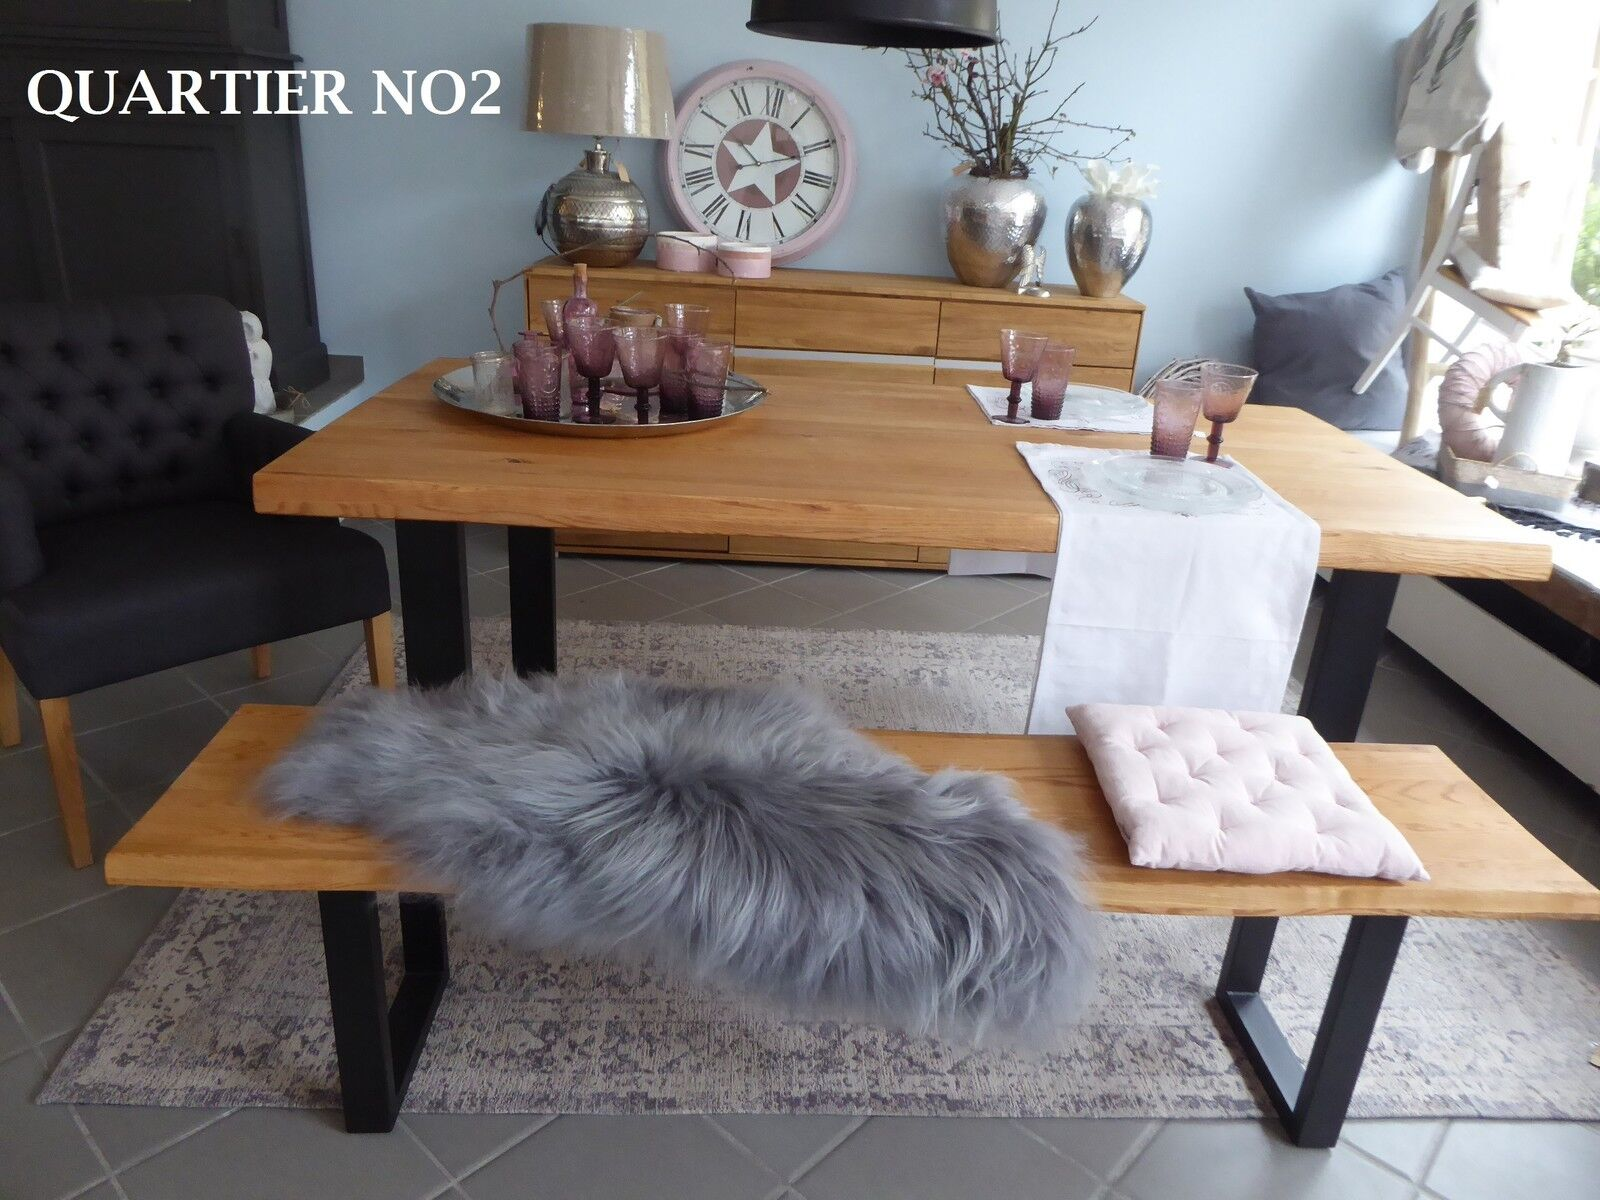 Artikel im quartier-no2-home-interieur-outlet-Shop bei eBay!